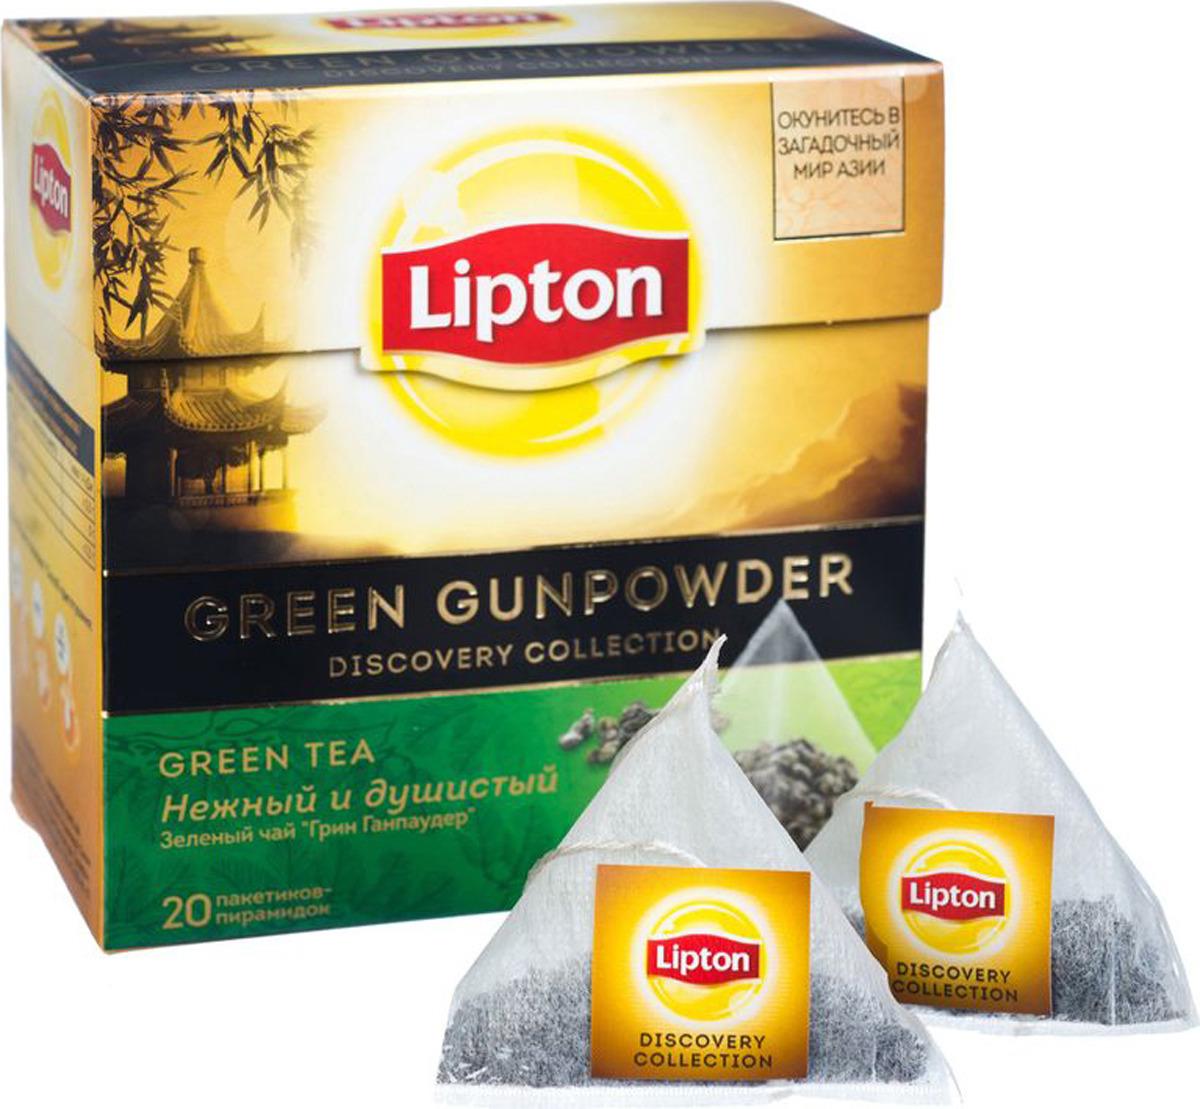 Lipton Зеленый чай Green gunpowder 20 шт цена